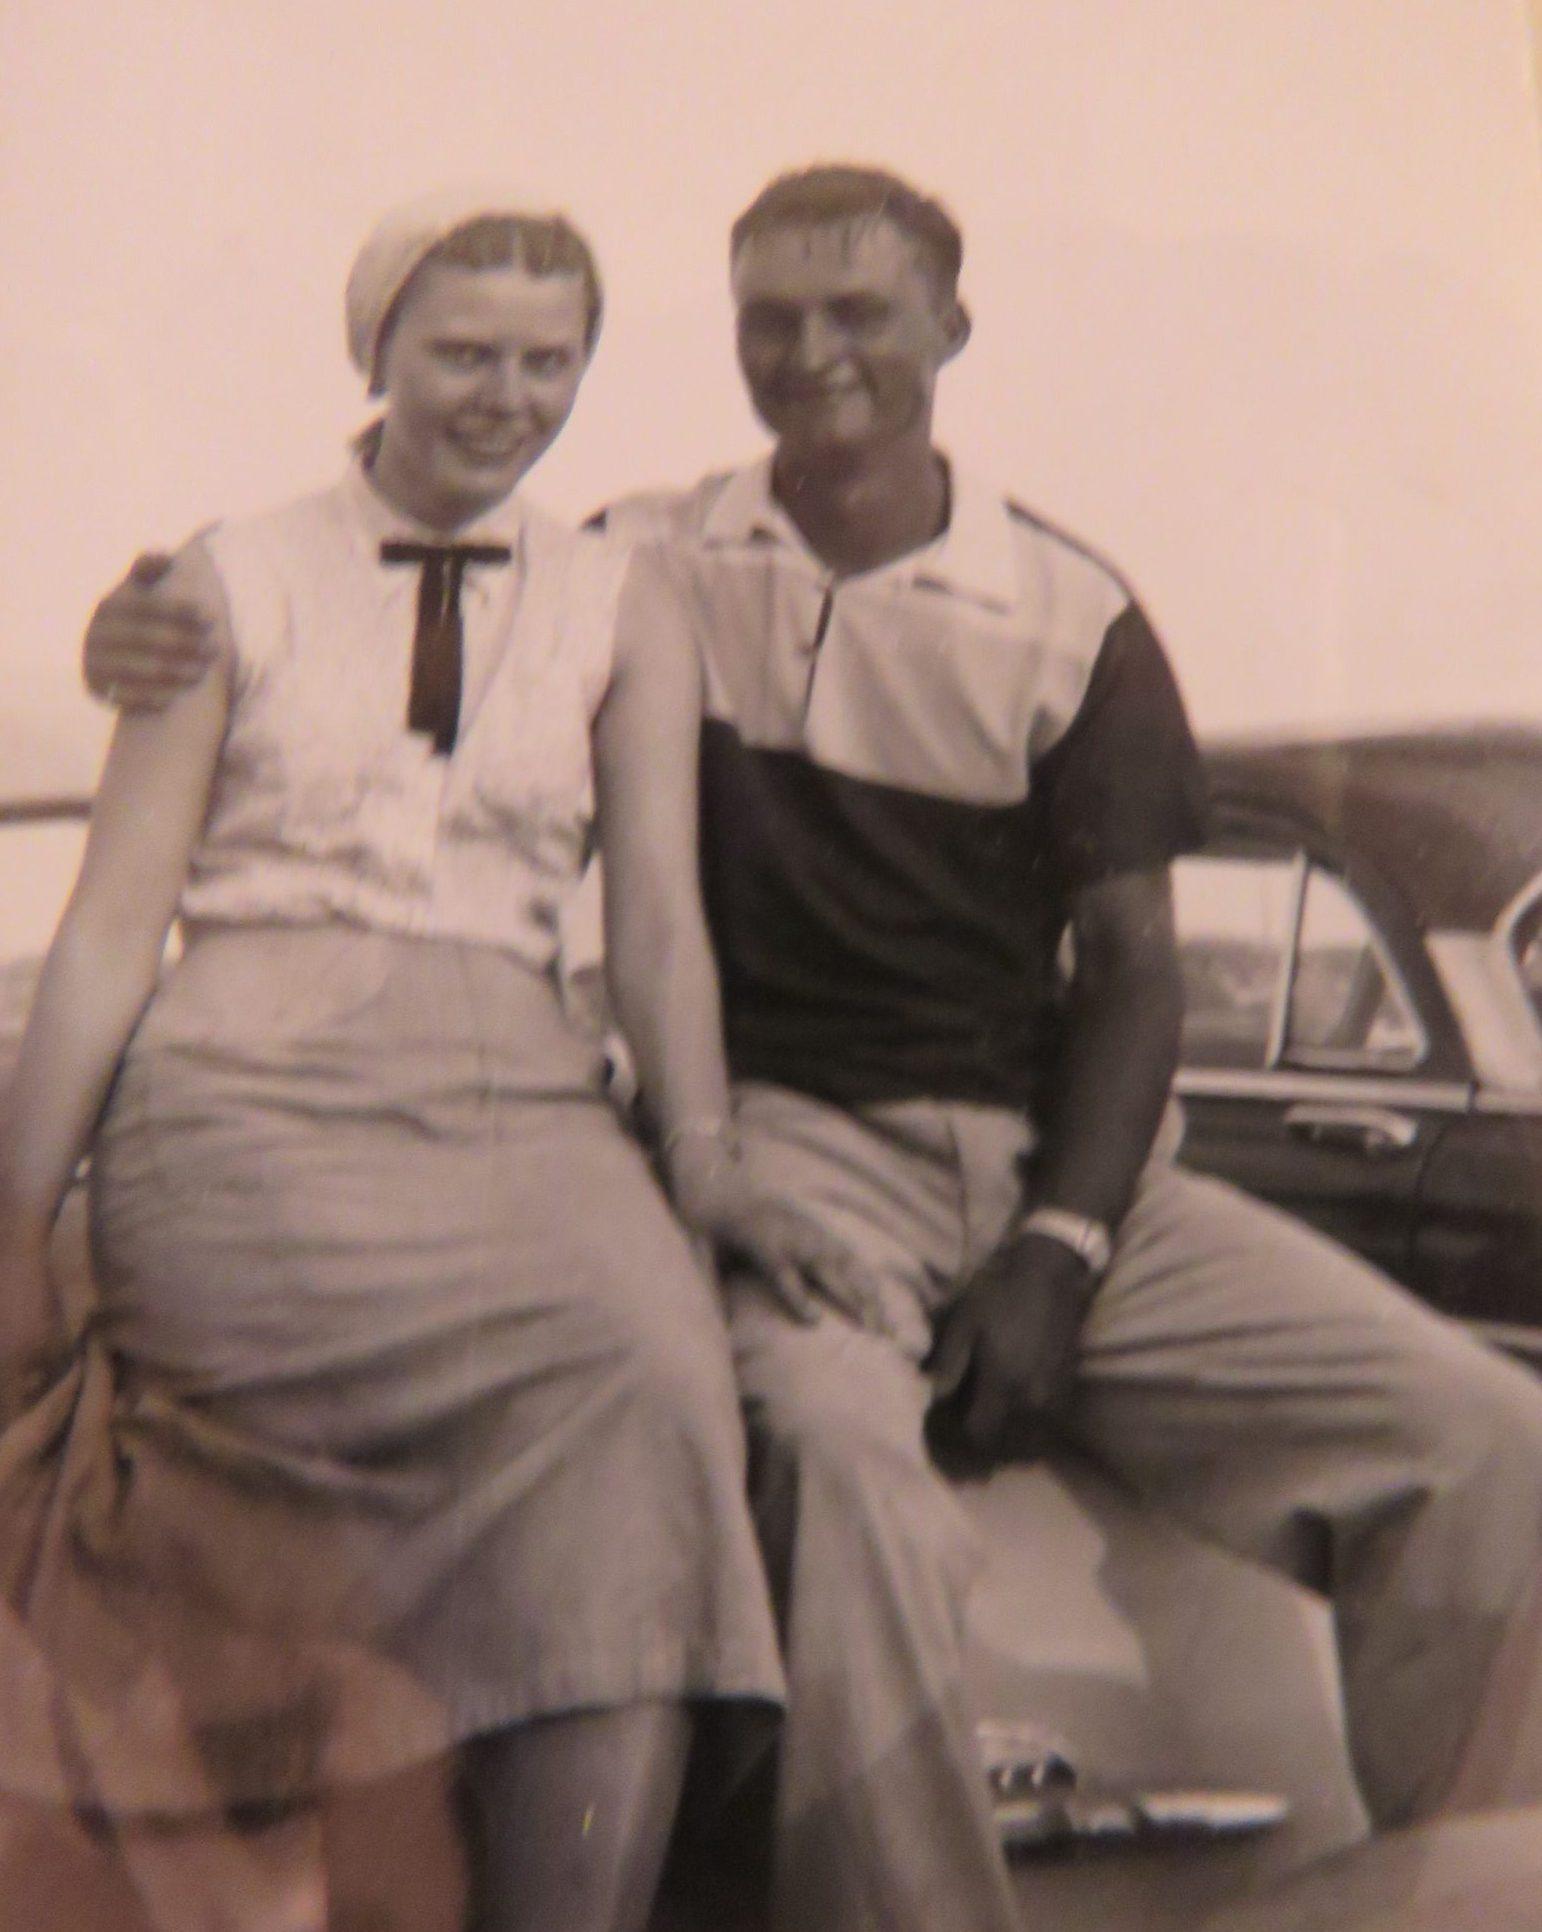 Vanderbrink - Krinke Collection - old pic of young Neil and Rosalie Krinke